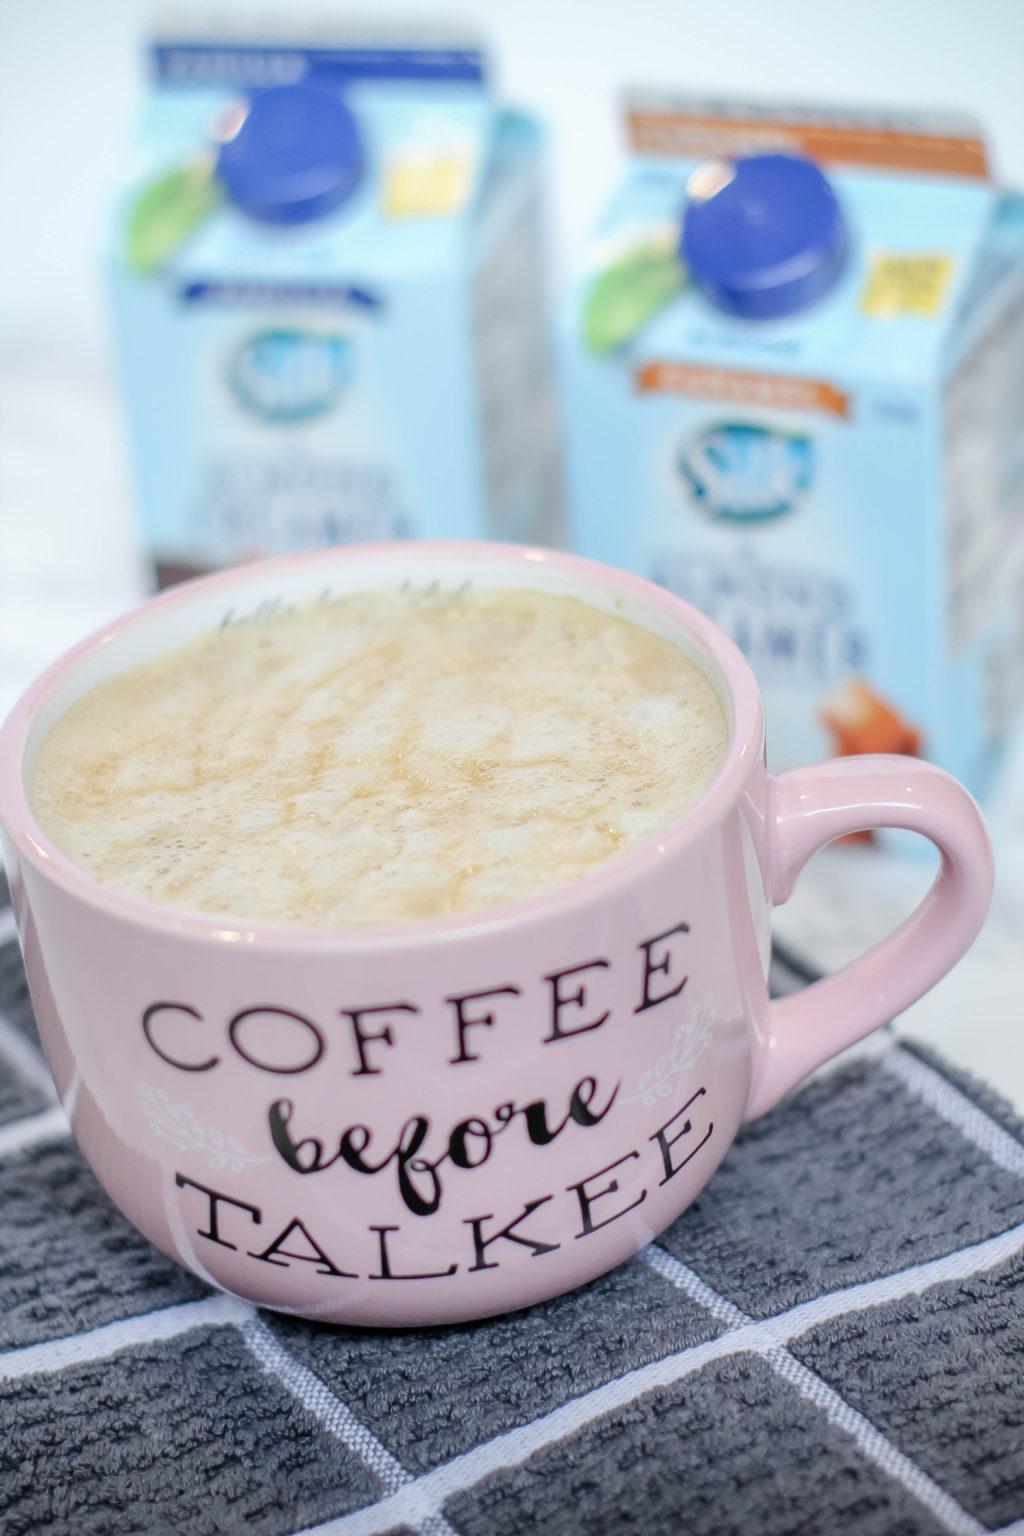 How to make a caramel macchiato! Best yet, it's a dairy free caramel macchiato! #dairyfree #caramelmacchiato #coffee